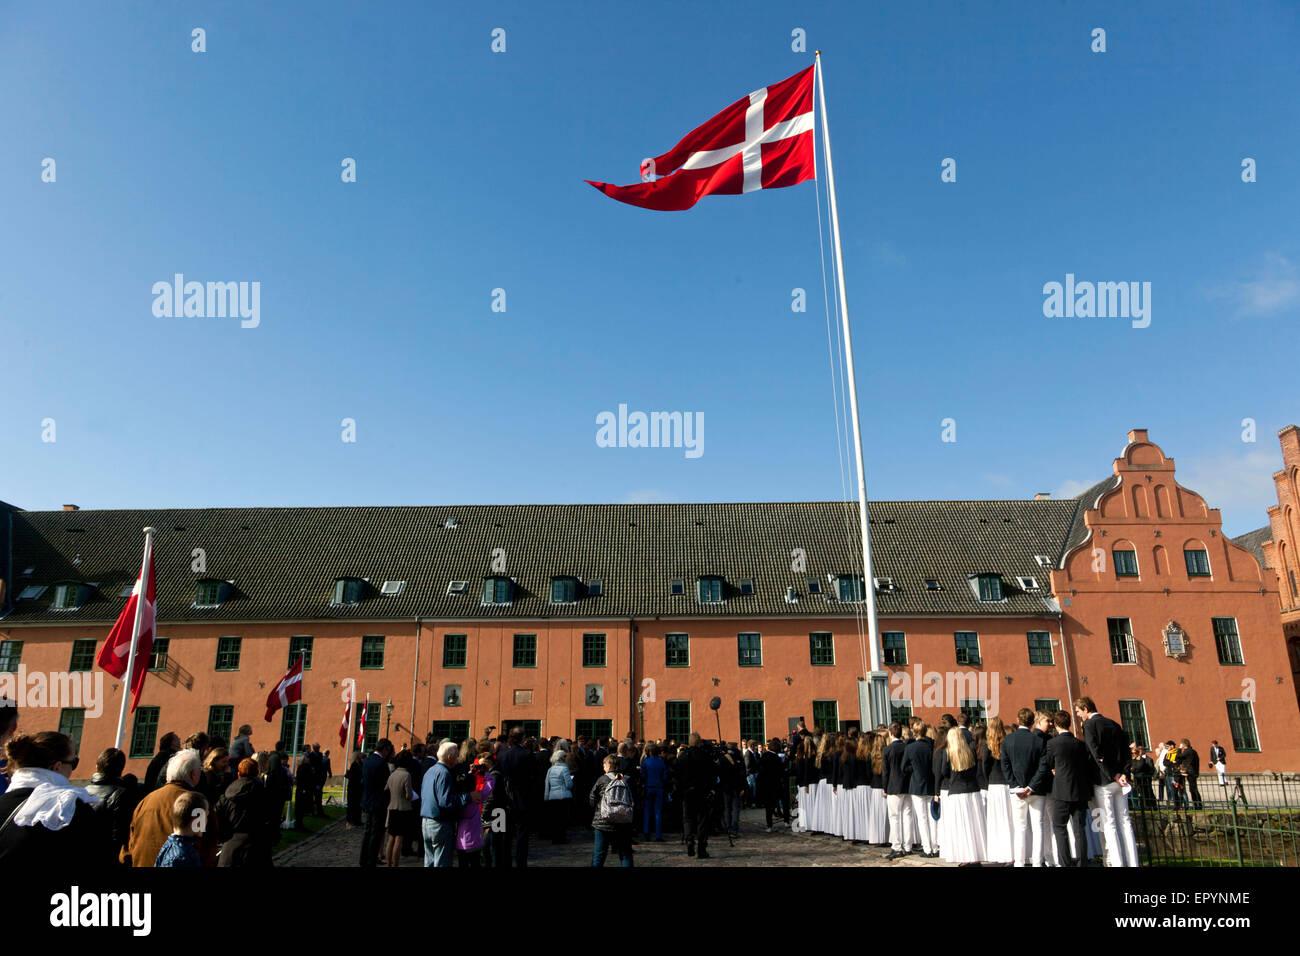 Naestved, Denmark, May 23rd, 2015: The Danish elite school, Herlufsholm, starts the celebration of it's 450th - Stock Image